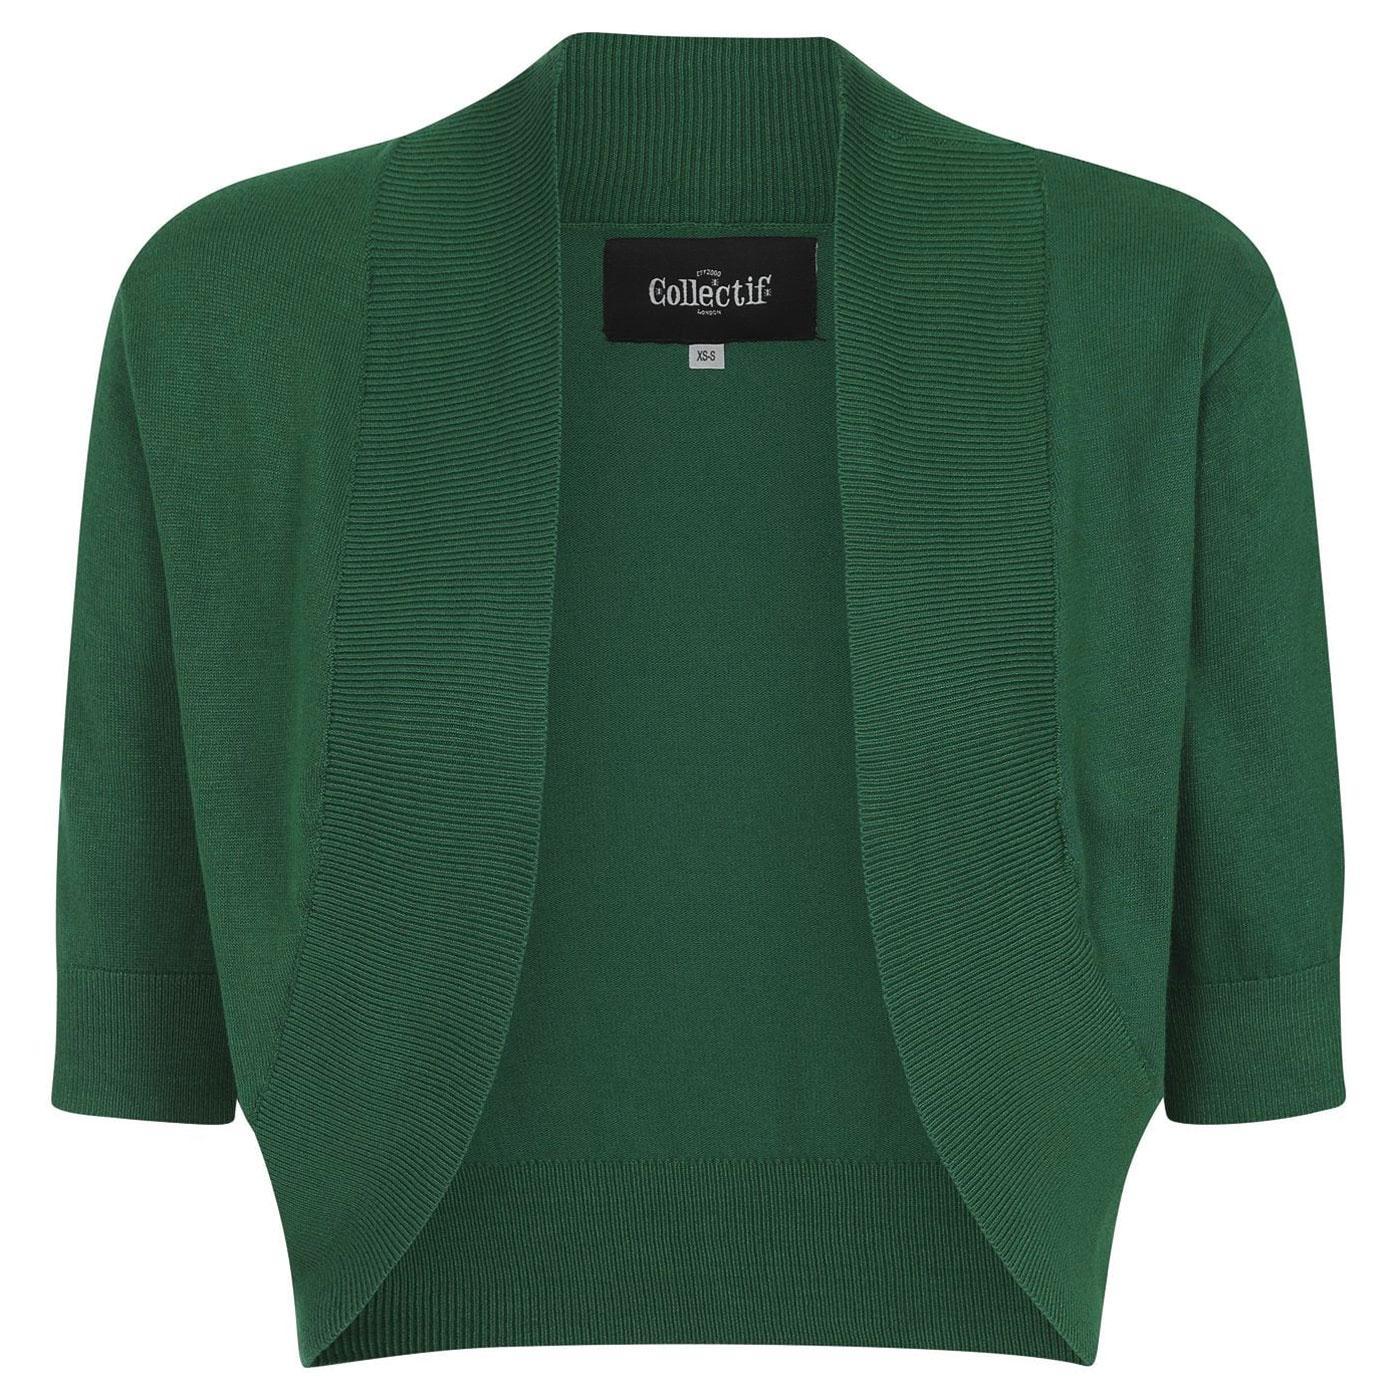 Jeanie COLLECTIF Retro Vintage Knitted Bolero G